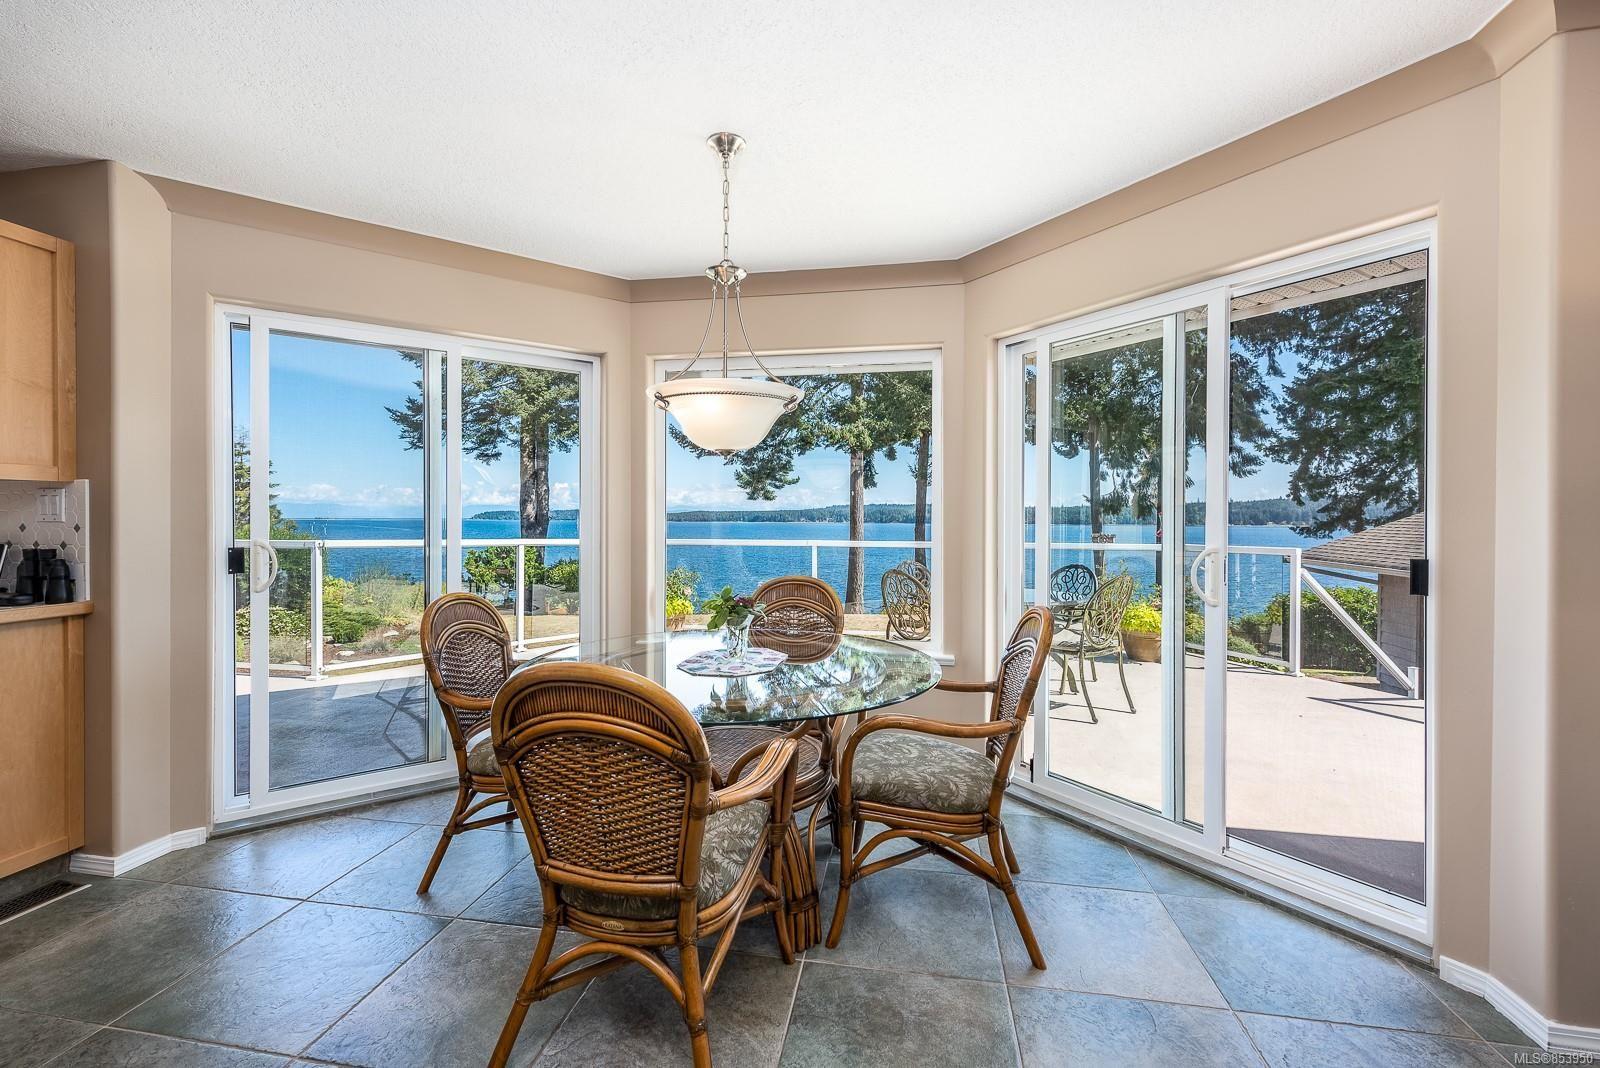 Photo 6: Photos: 5880 GARVIN Rd in : CV Union Bay/Fanny Bay House for sale (Comox Valley)  : MLS®# 853950